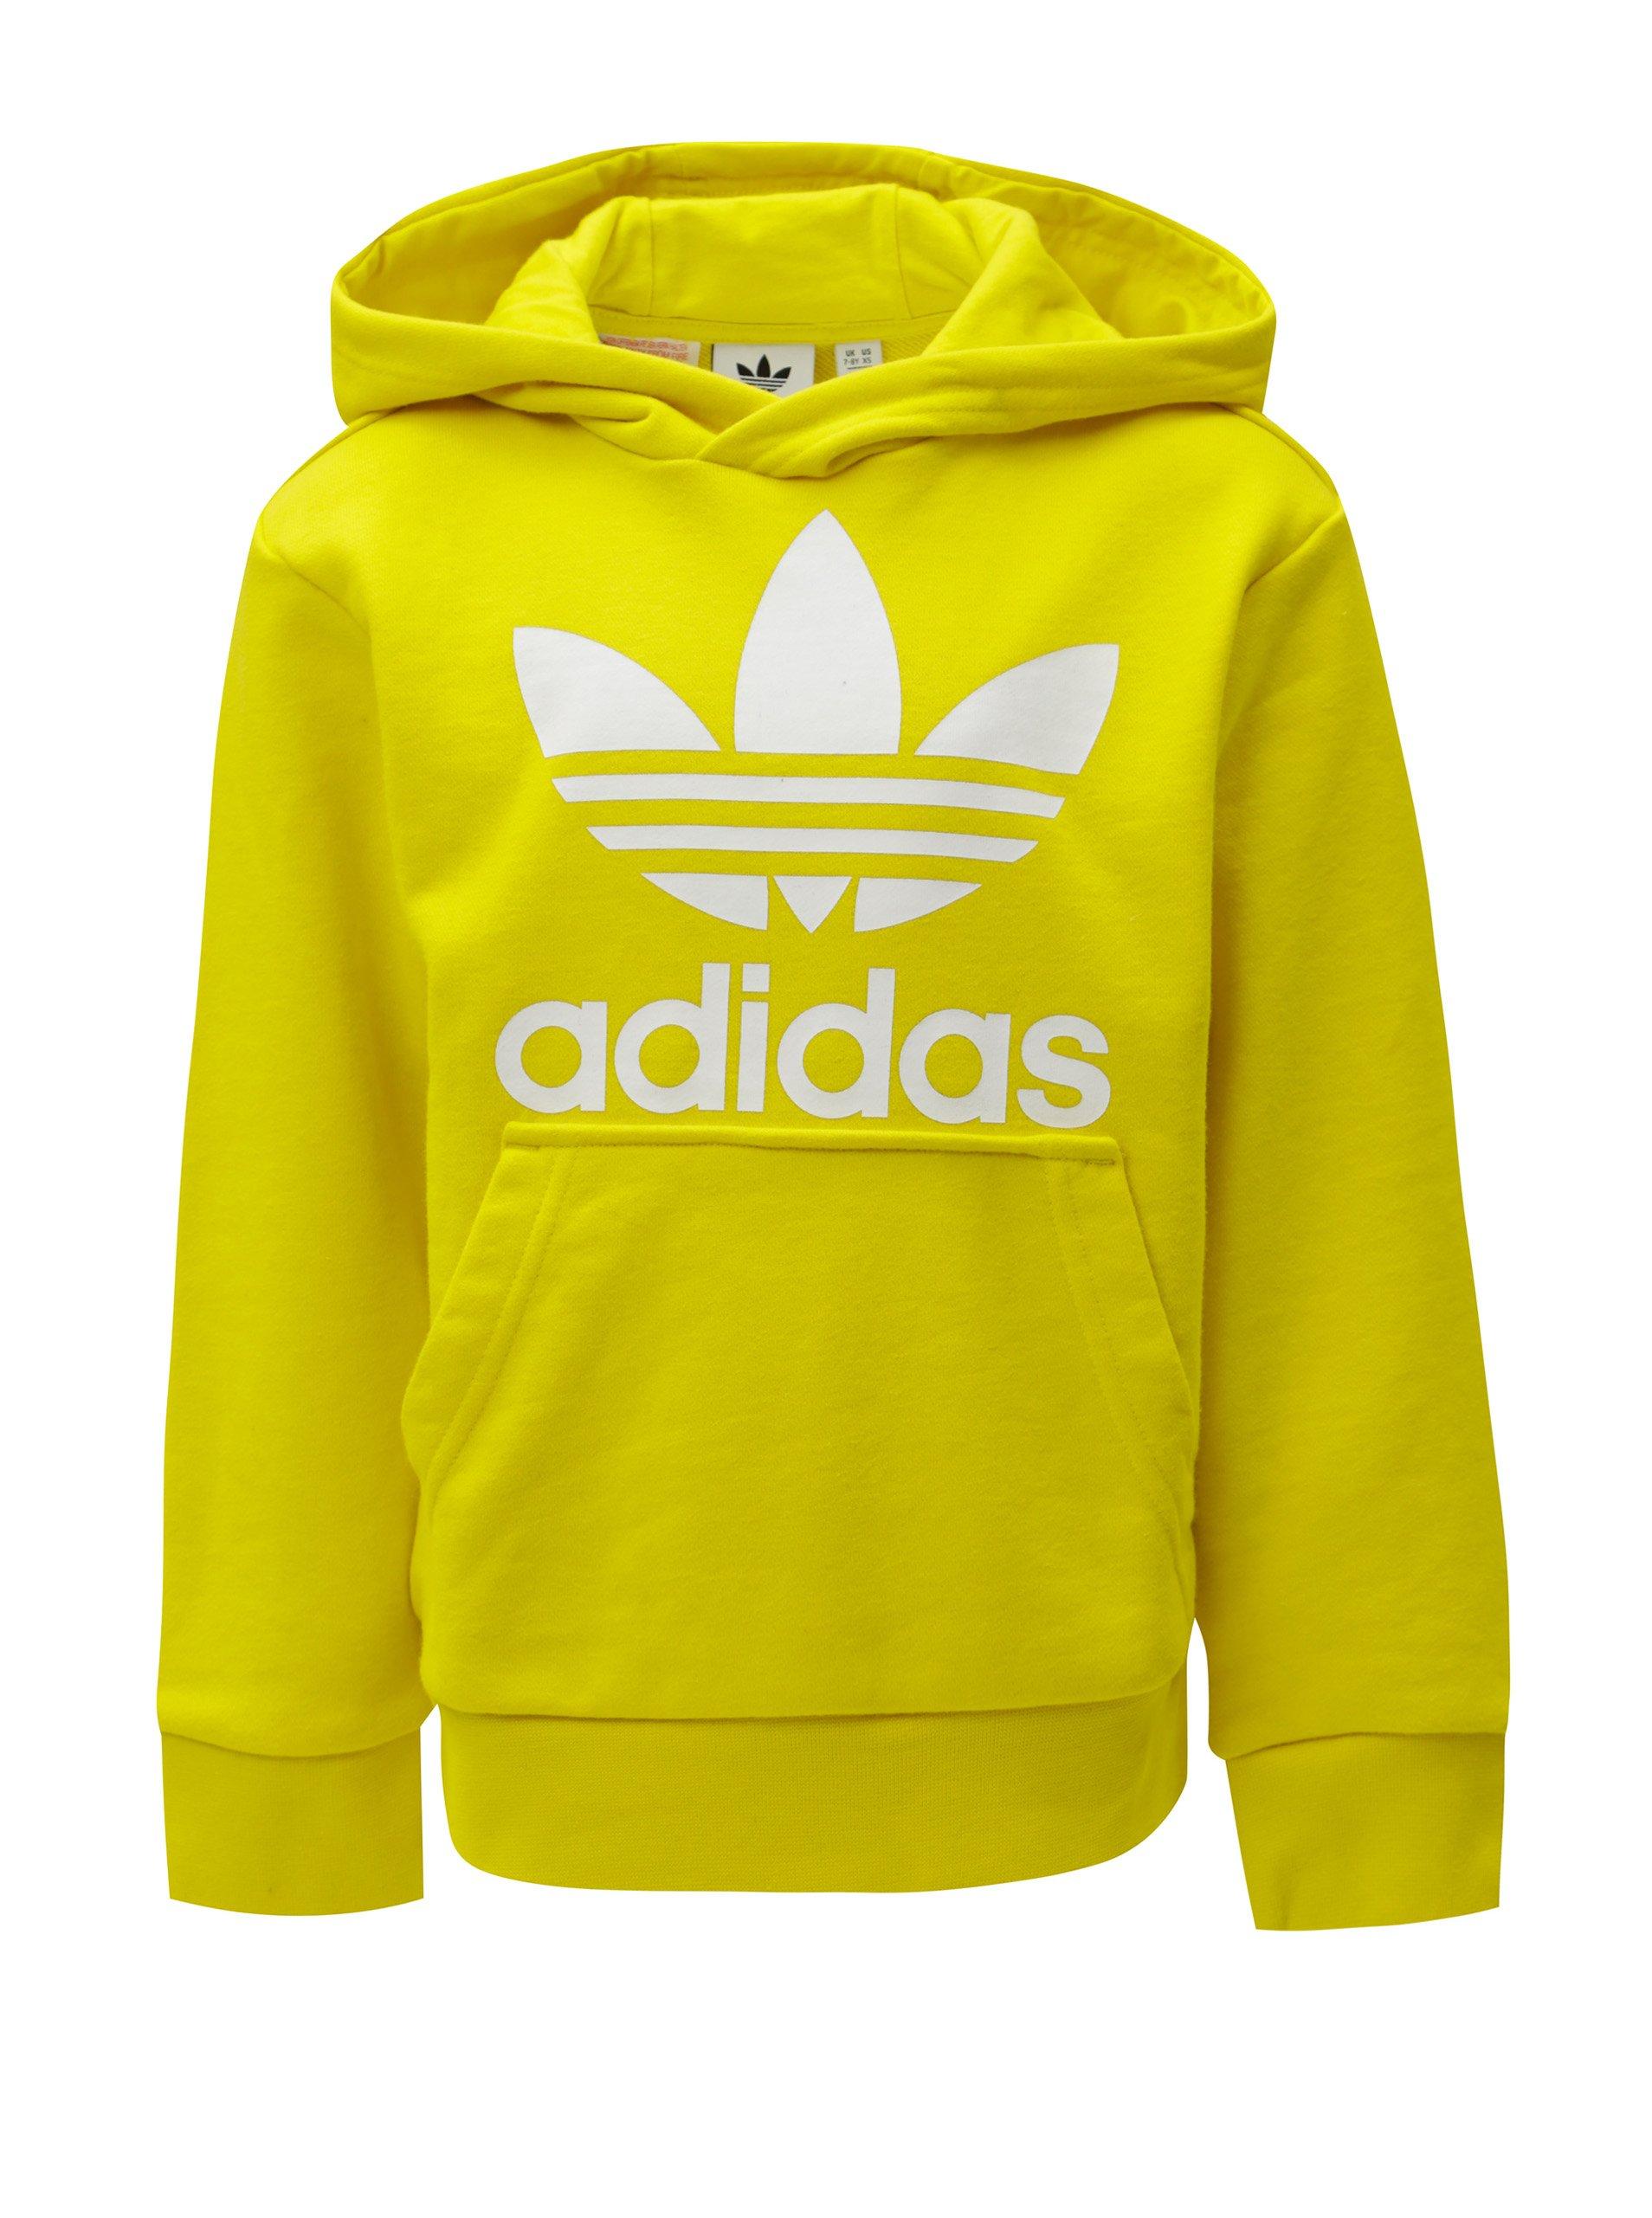 ab83d6a203 Žltá dětská mikina s kapucňou a klokaním vreckom adidas Originals Trefoil